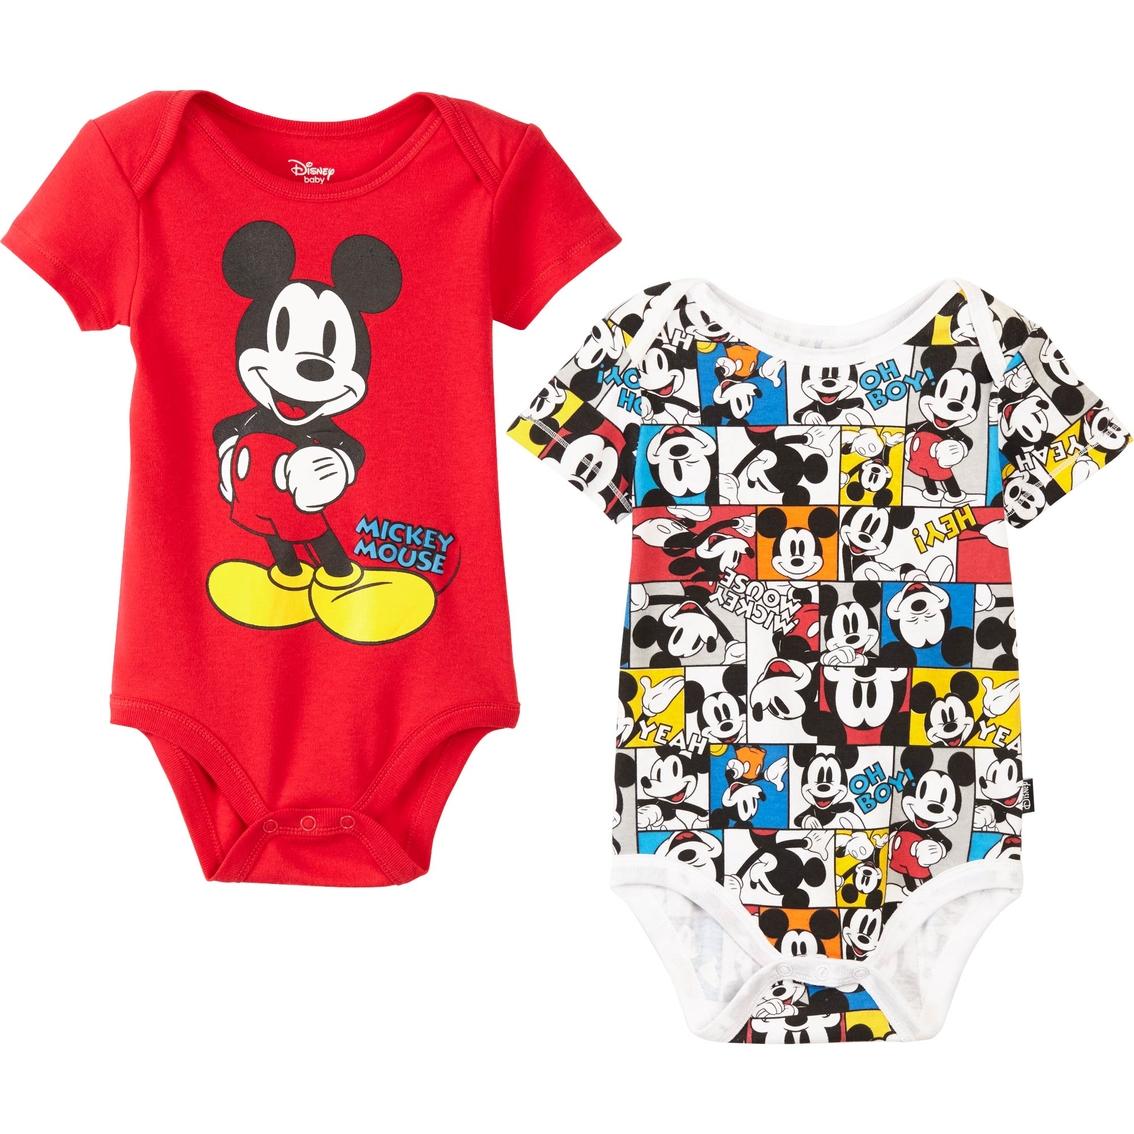 3649a3854b Negozio di sconti online,Disney Baby Boy Swimwear